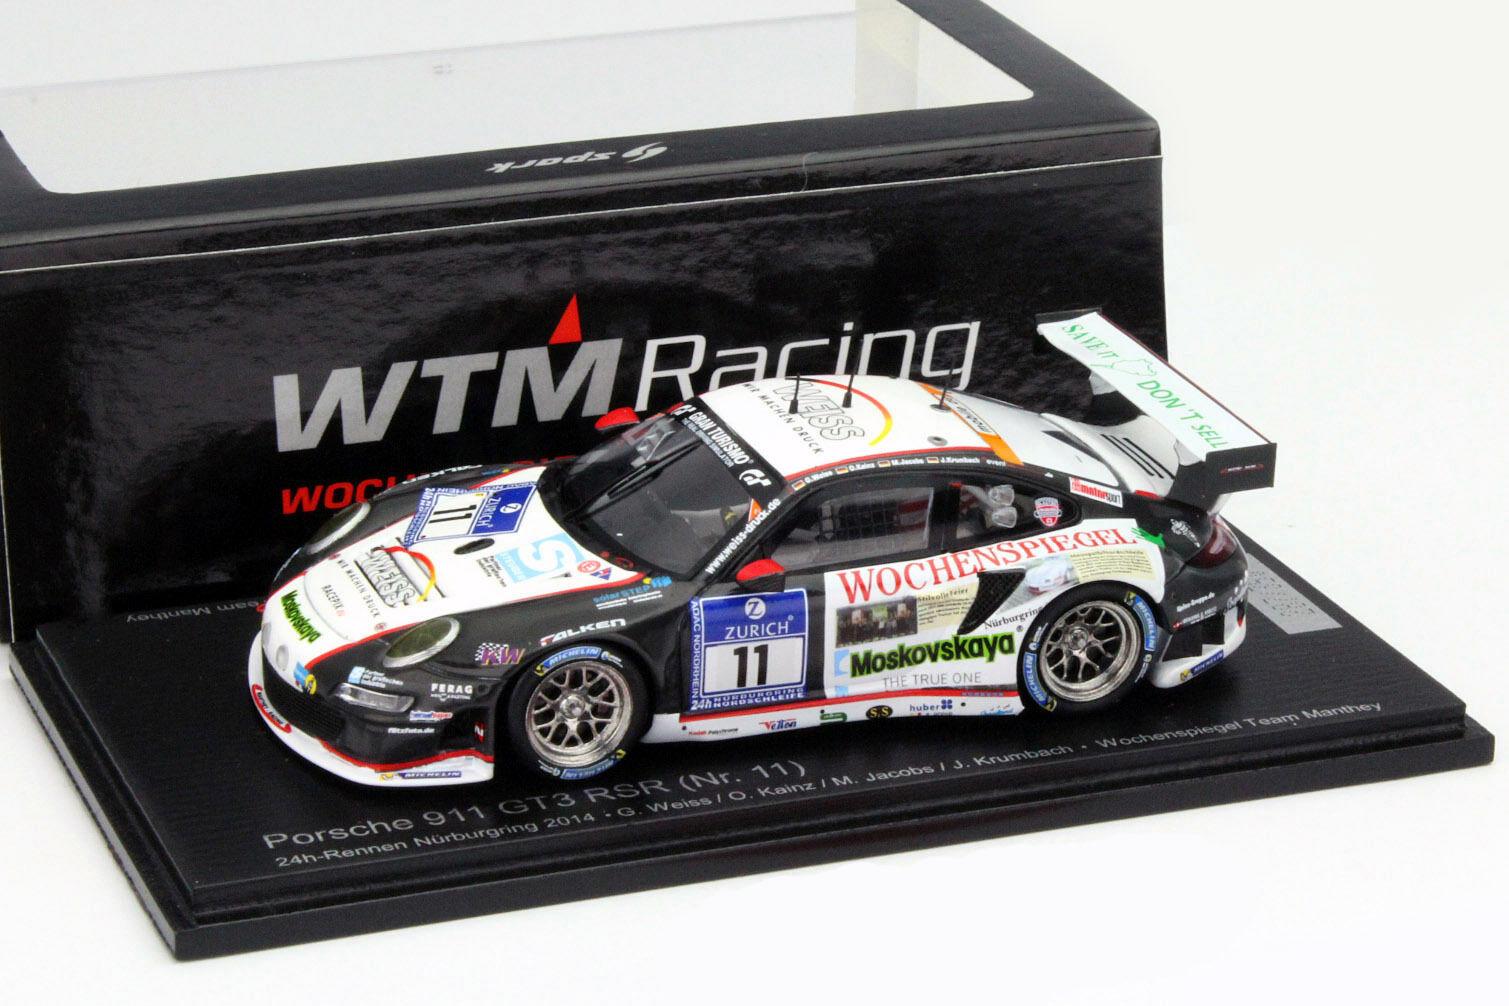 Porsche 911 GT3 RSR  11  24h Nürburgbague 2014 1 43 Spark  chaud